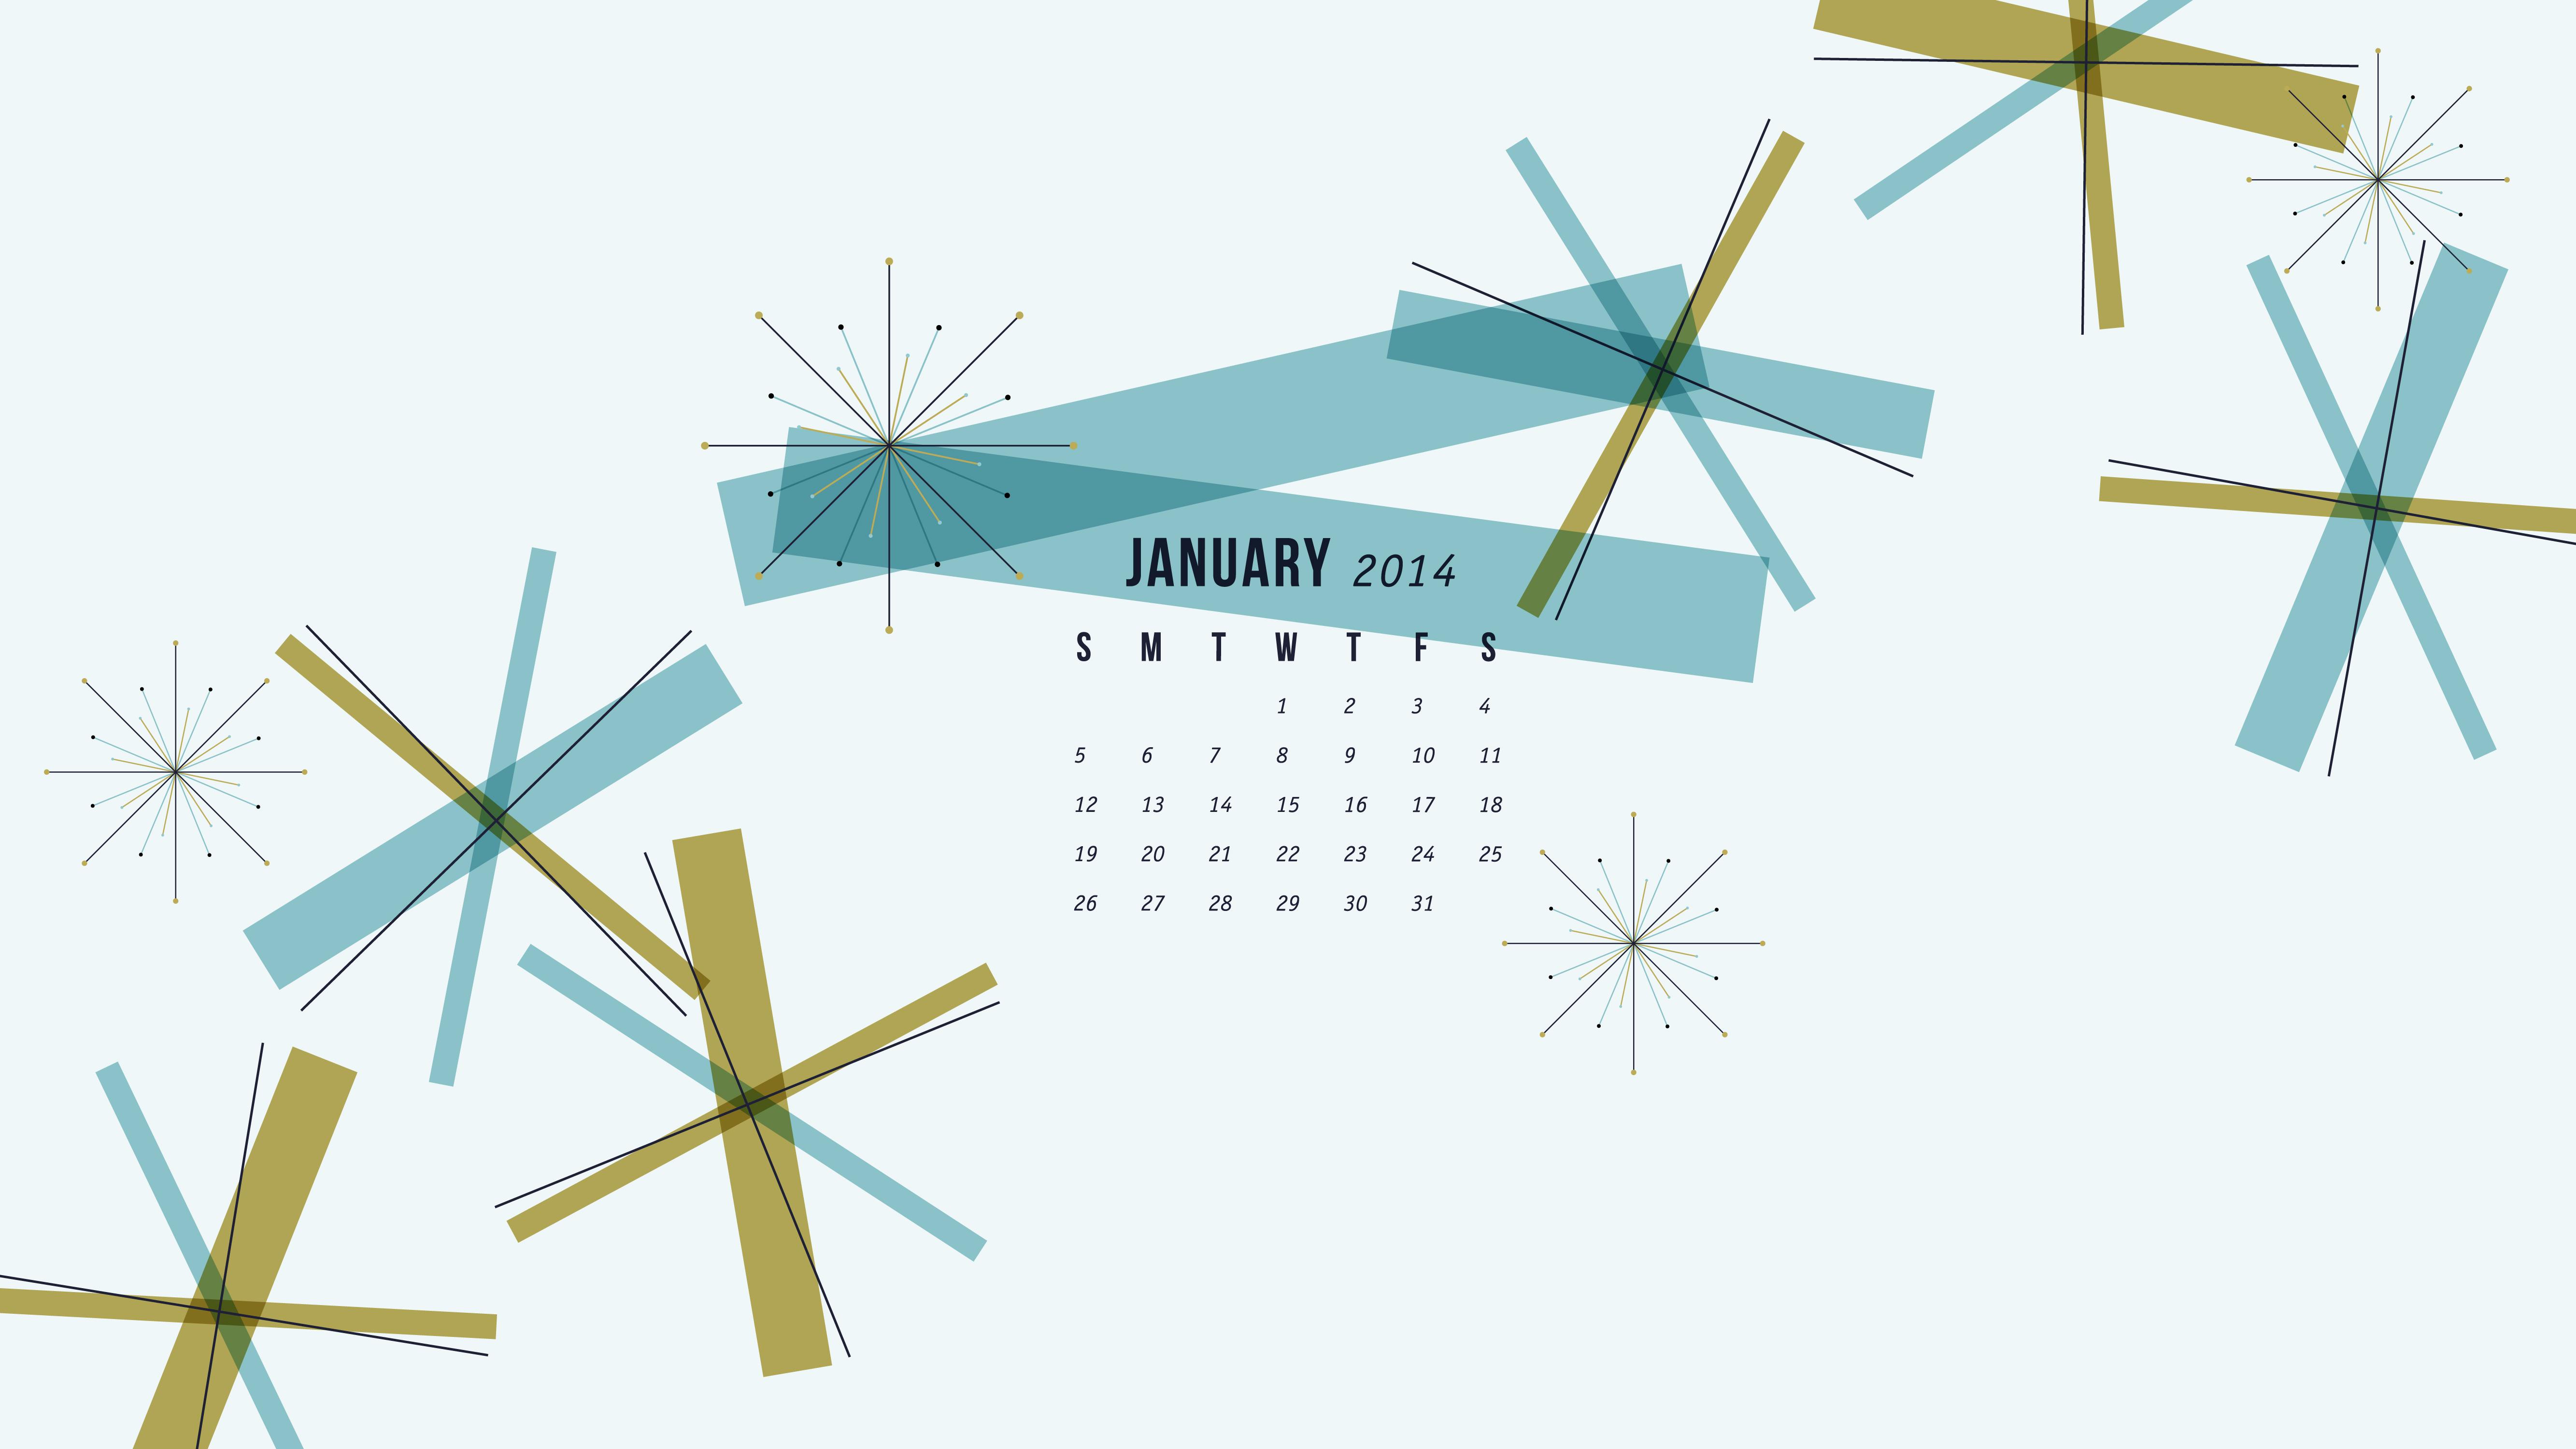 January 2014 Calendar Wallpaper Sarah Hearts